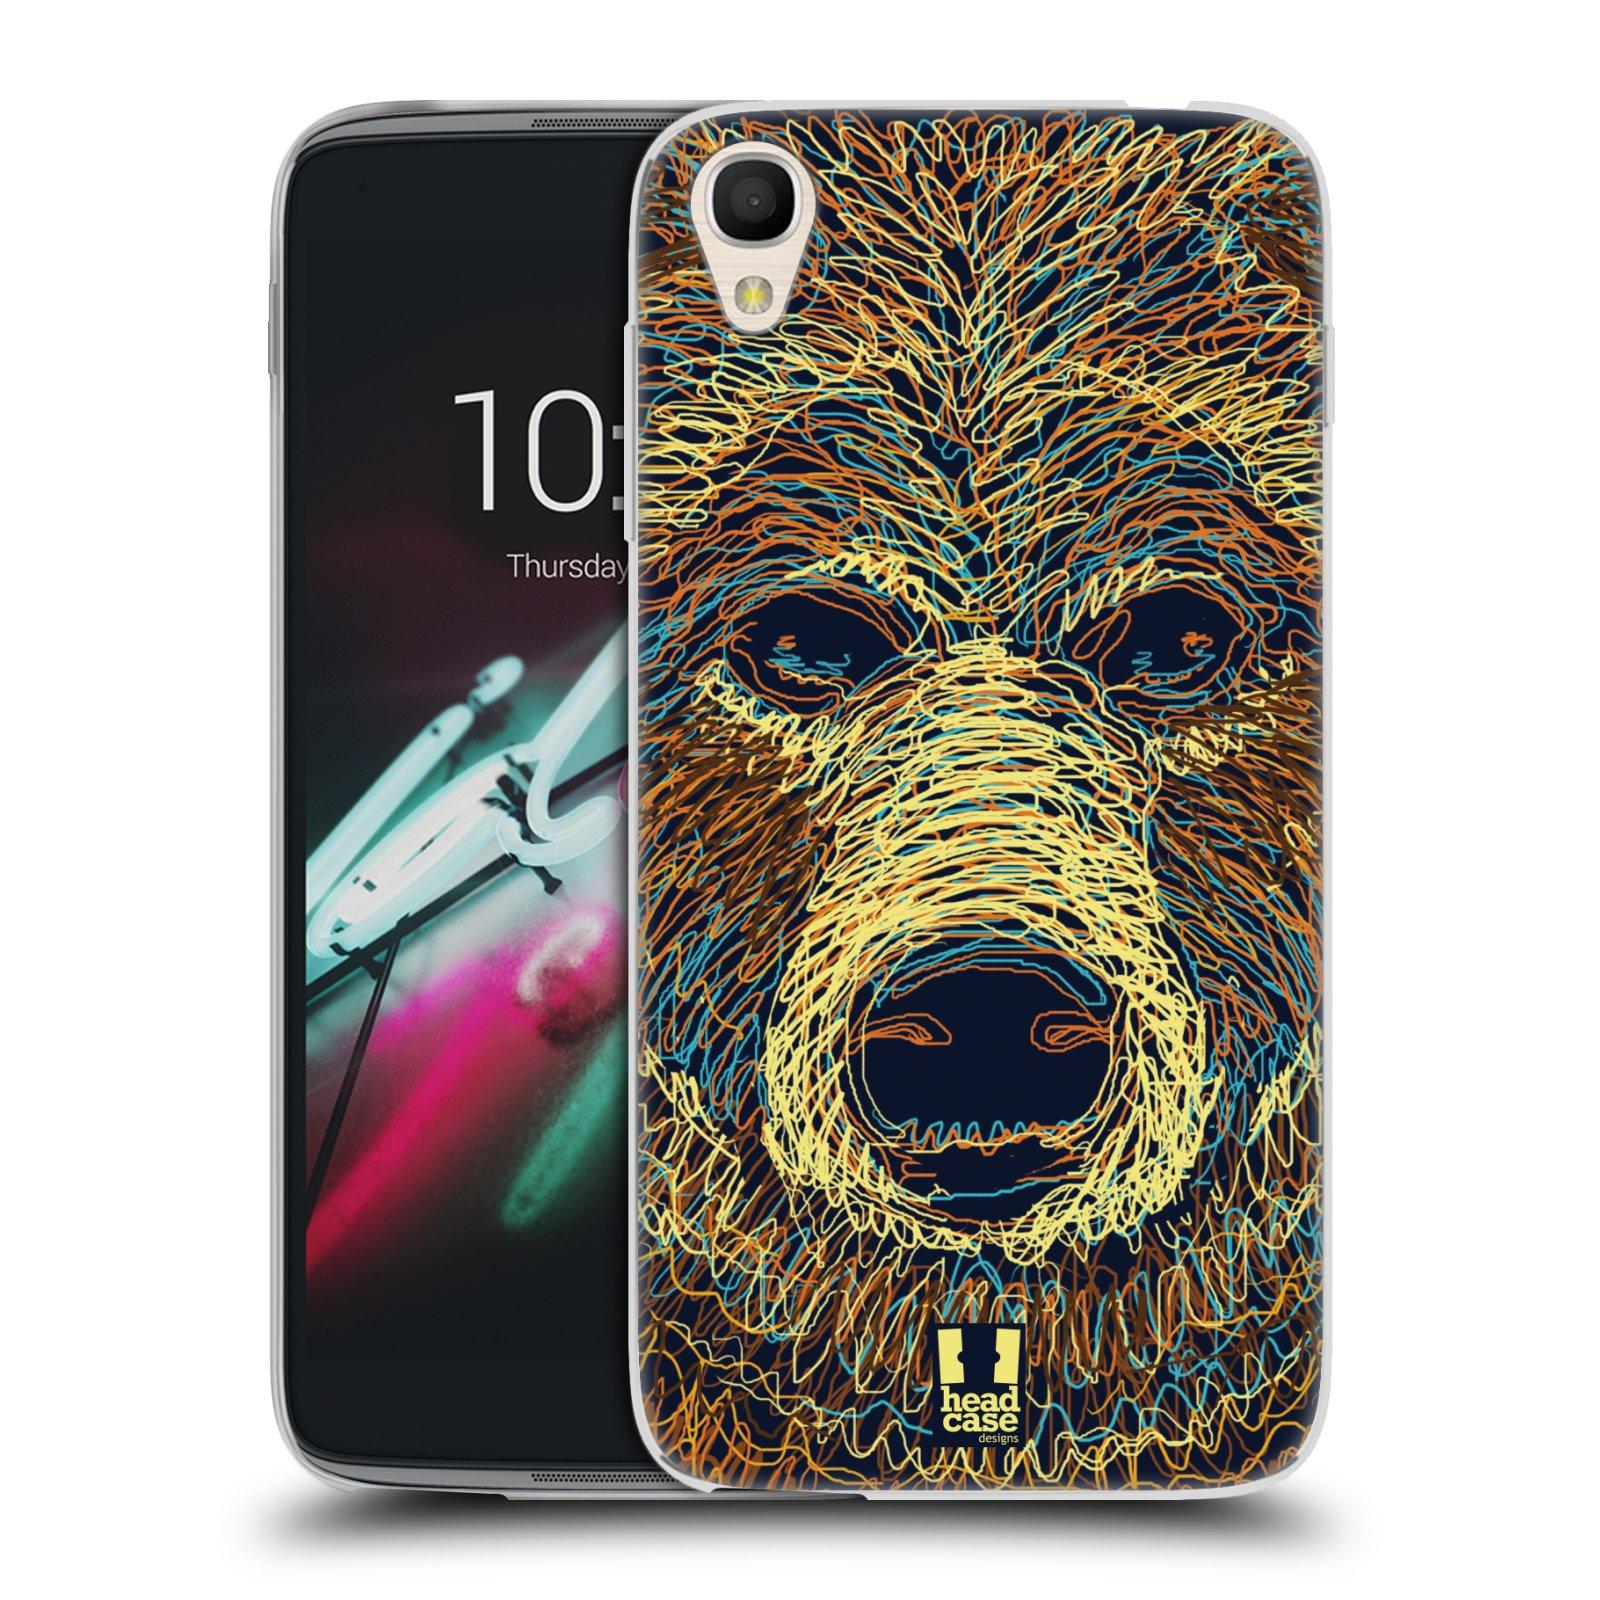 HEAD CASE silikonový obal na mobil Alcatel Idol 3 OT-6039Y (4.7) vzor zvíře čmáranice medvěd